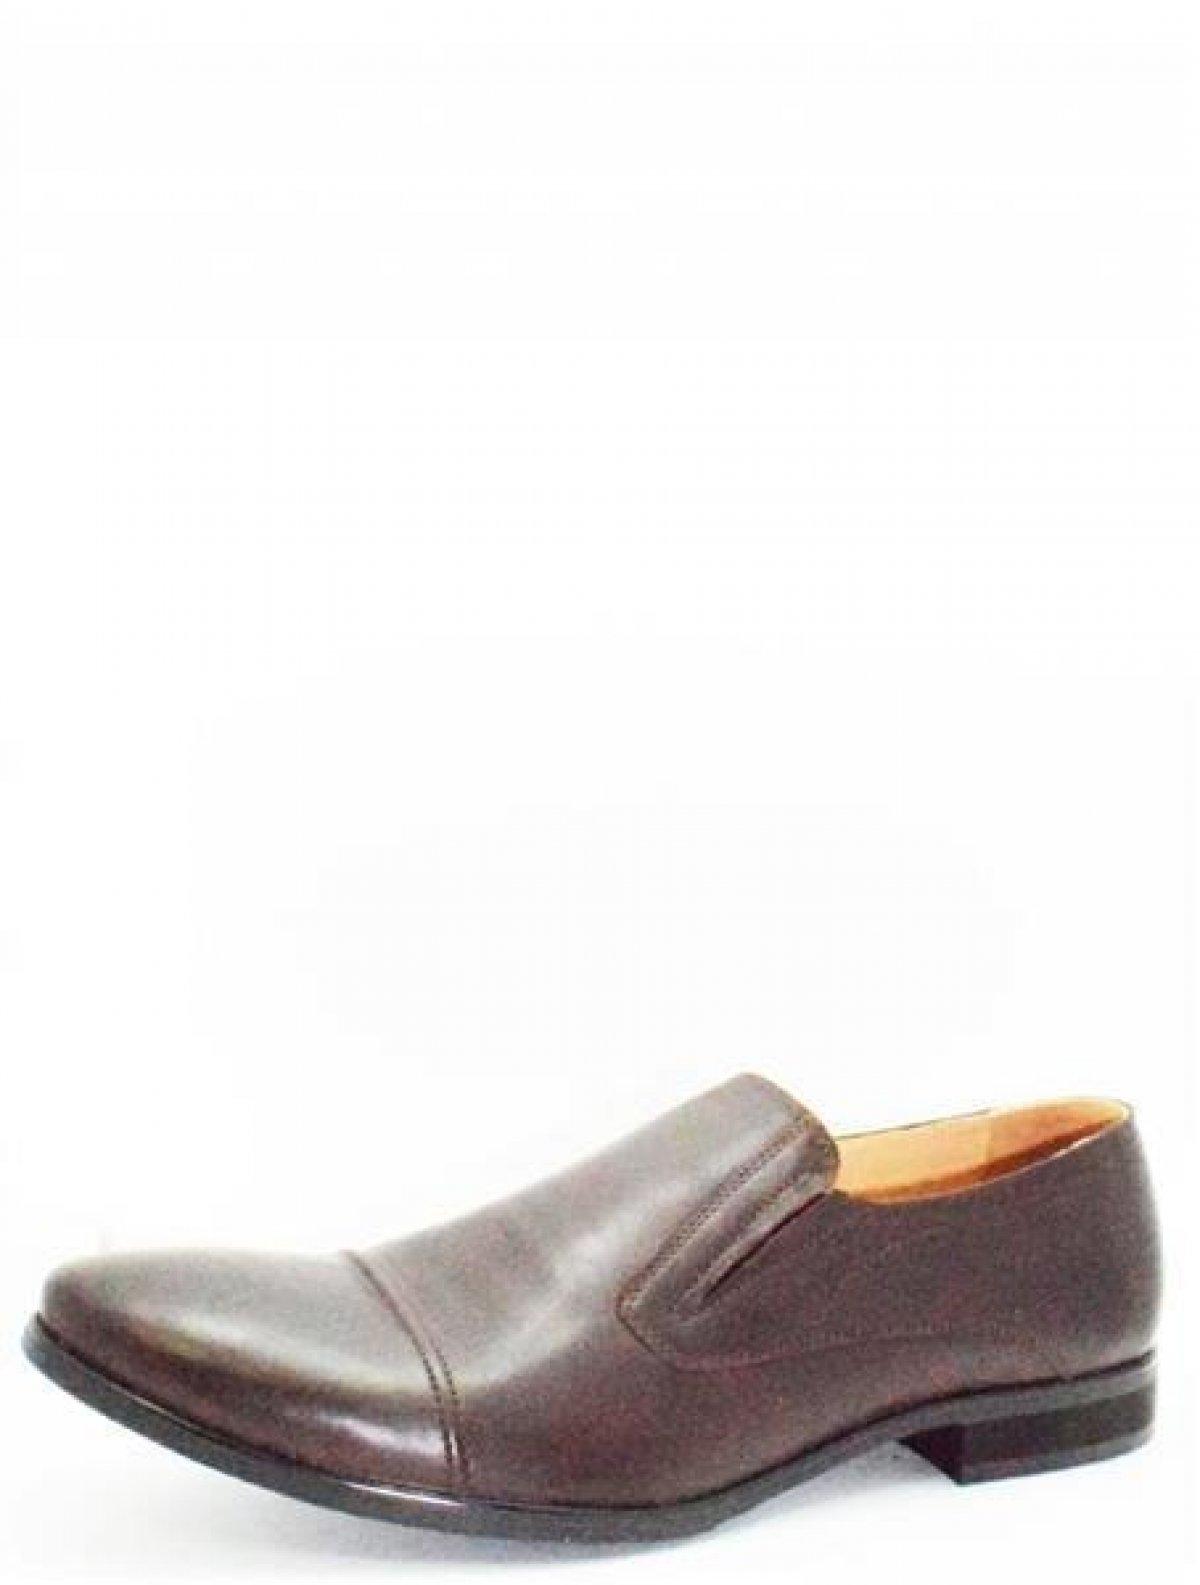 RU8404/V356 мужские туфли